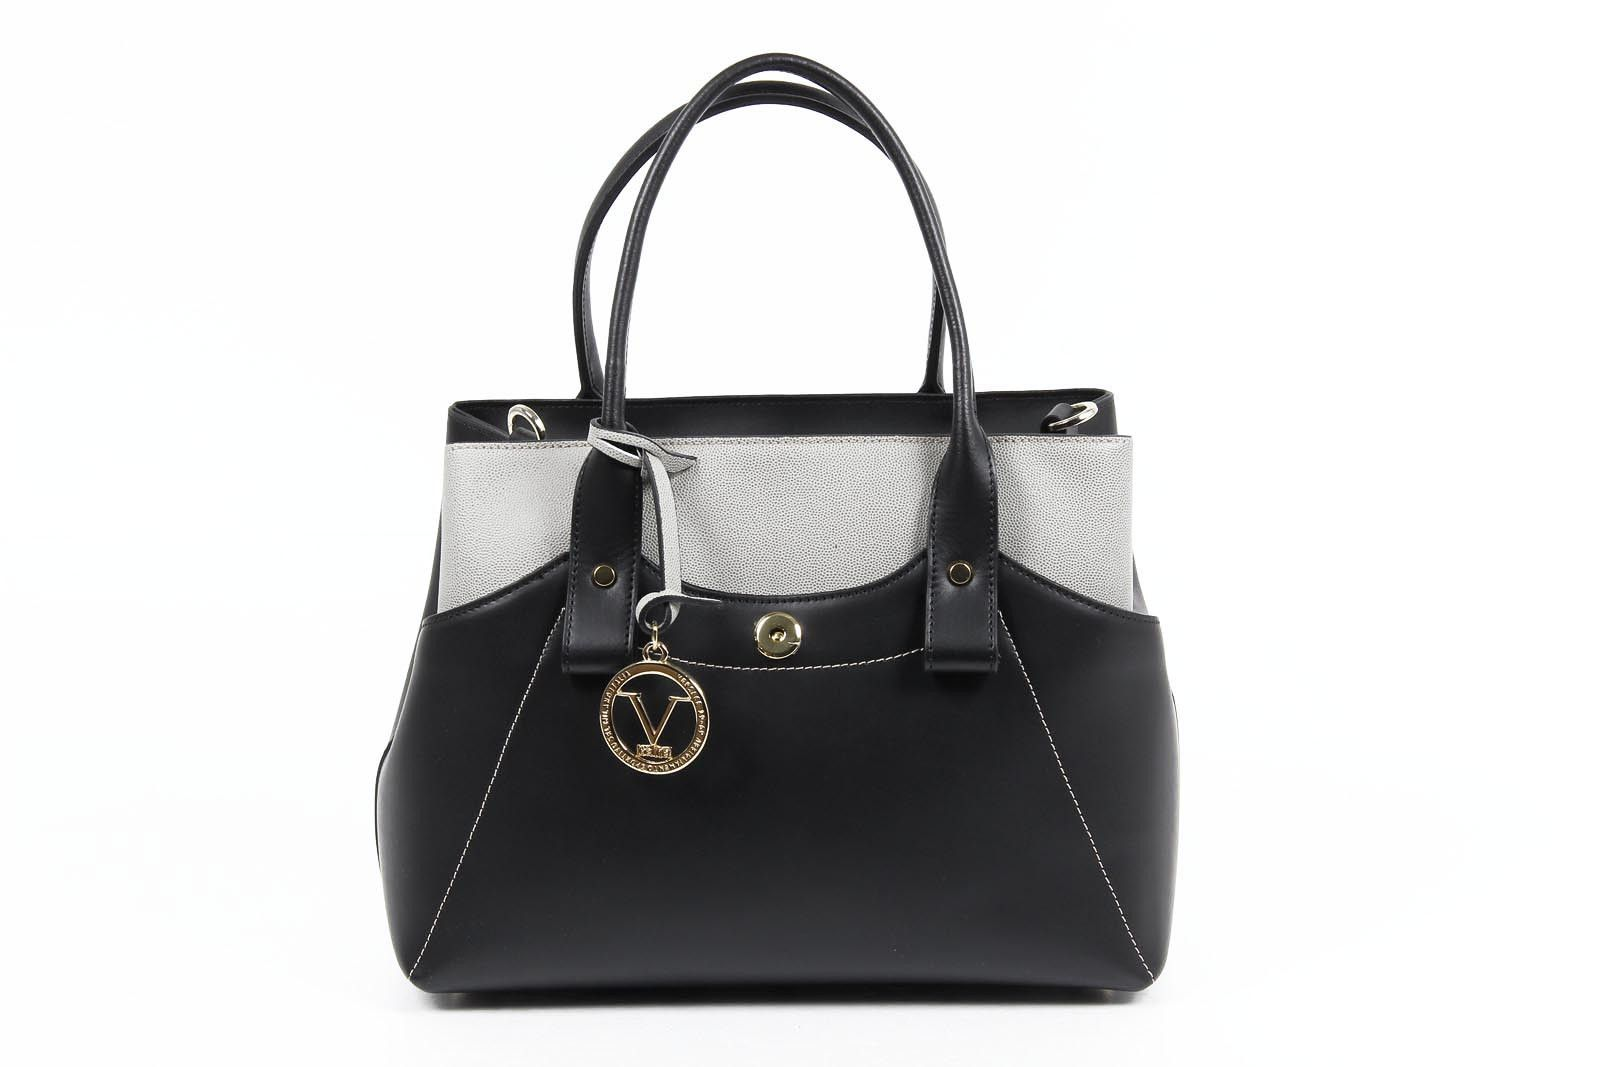 Versace 19.69 Abbigliamento Sportivo Srl ladies handbag H491/52 RUGA/BELUGATO NERO/GRIGIO